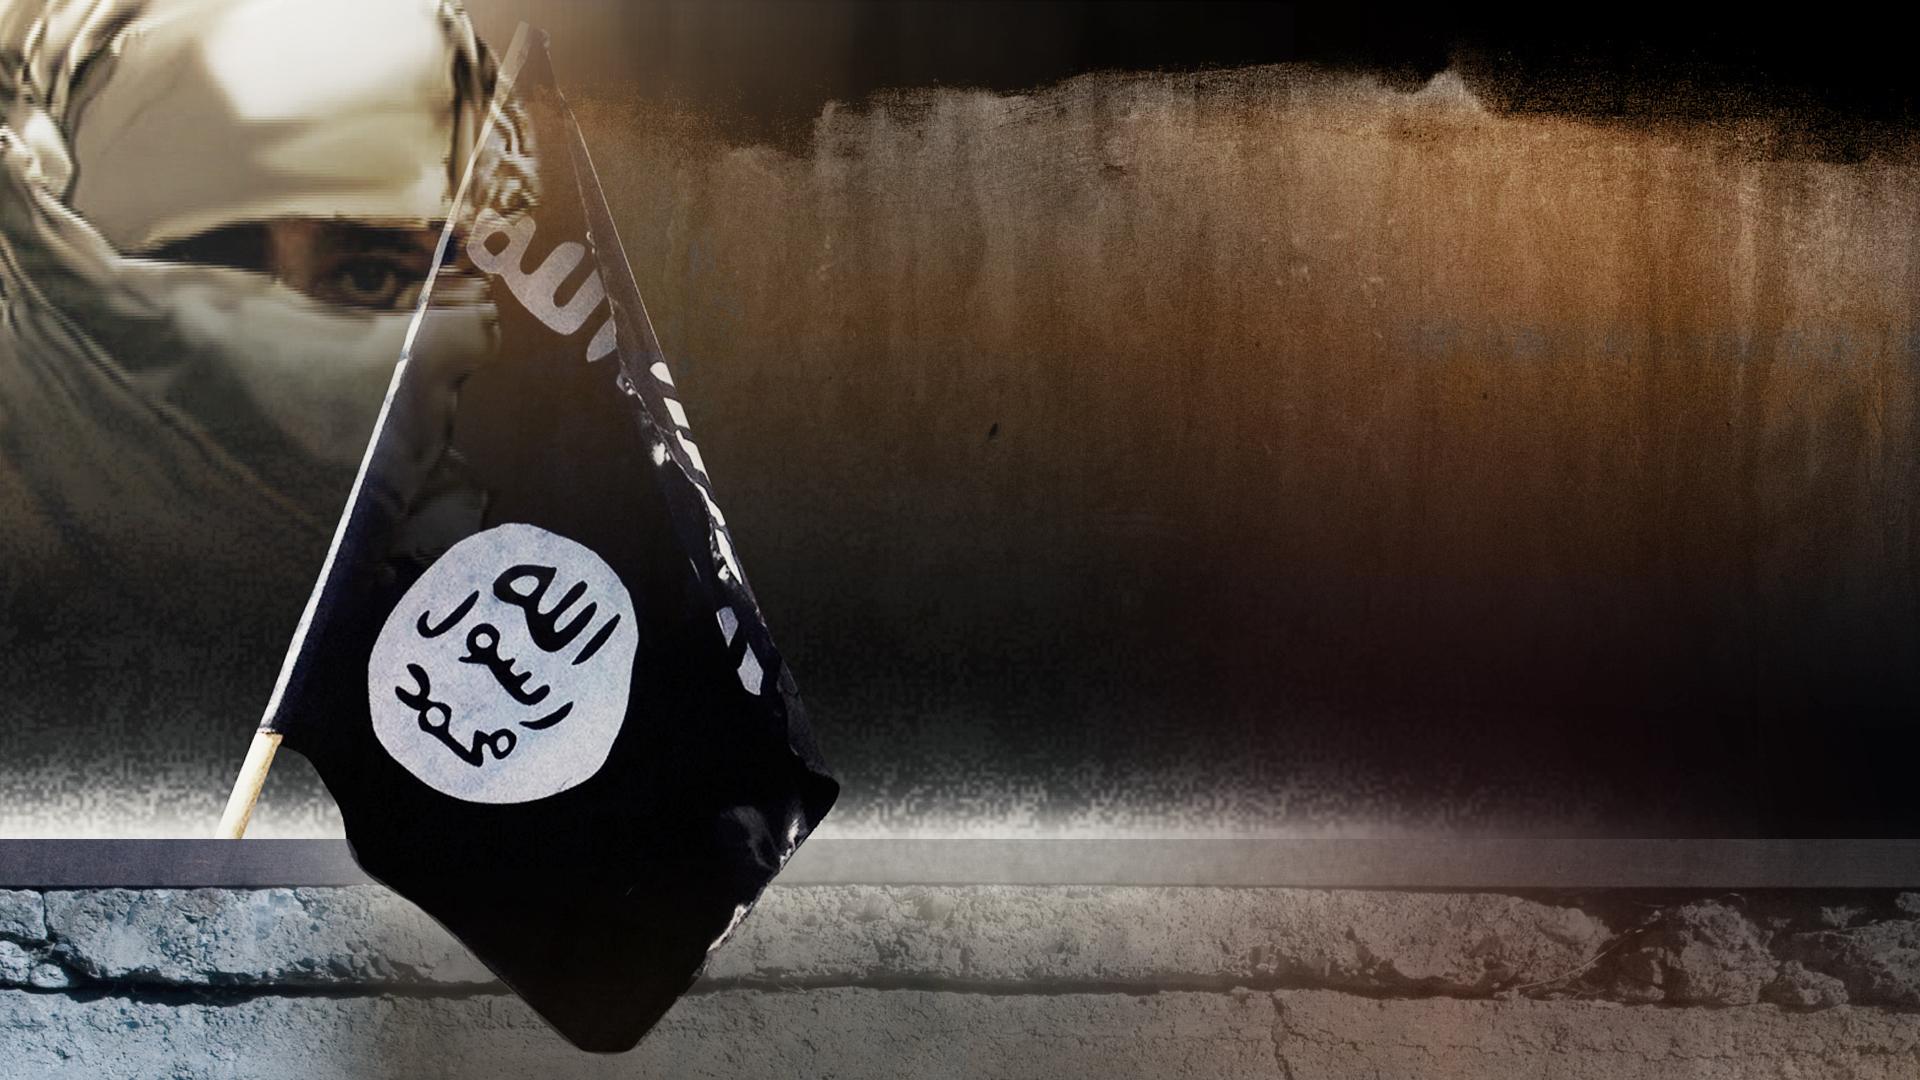 https://i0.wp.com/www.pbs.org/newshour/wp-content/uploads/2014/09/islamicstate.jpg